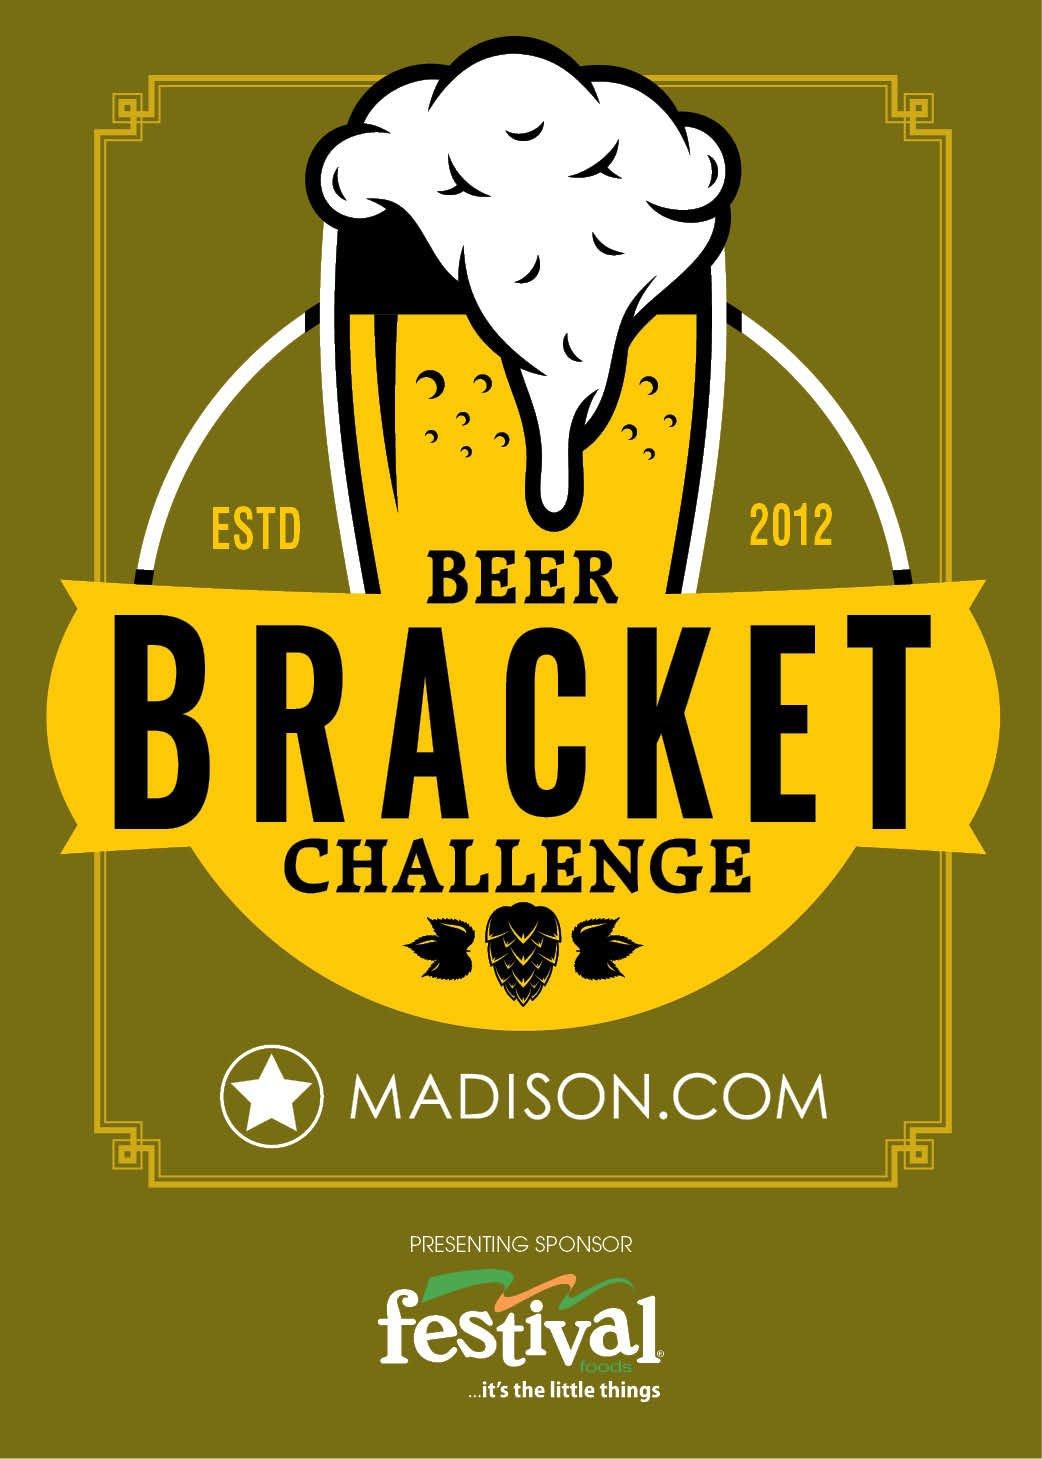 2019 MADISON.COM BEER BRACKET: Help determine the beer of the year!